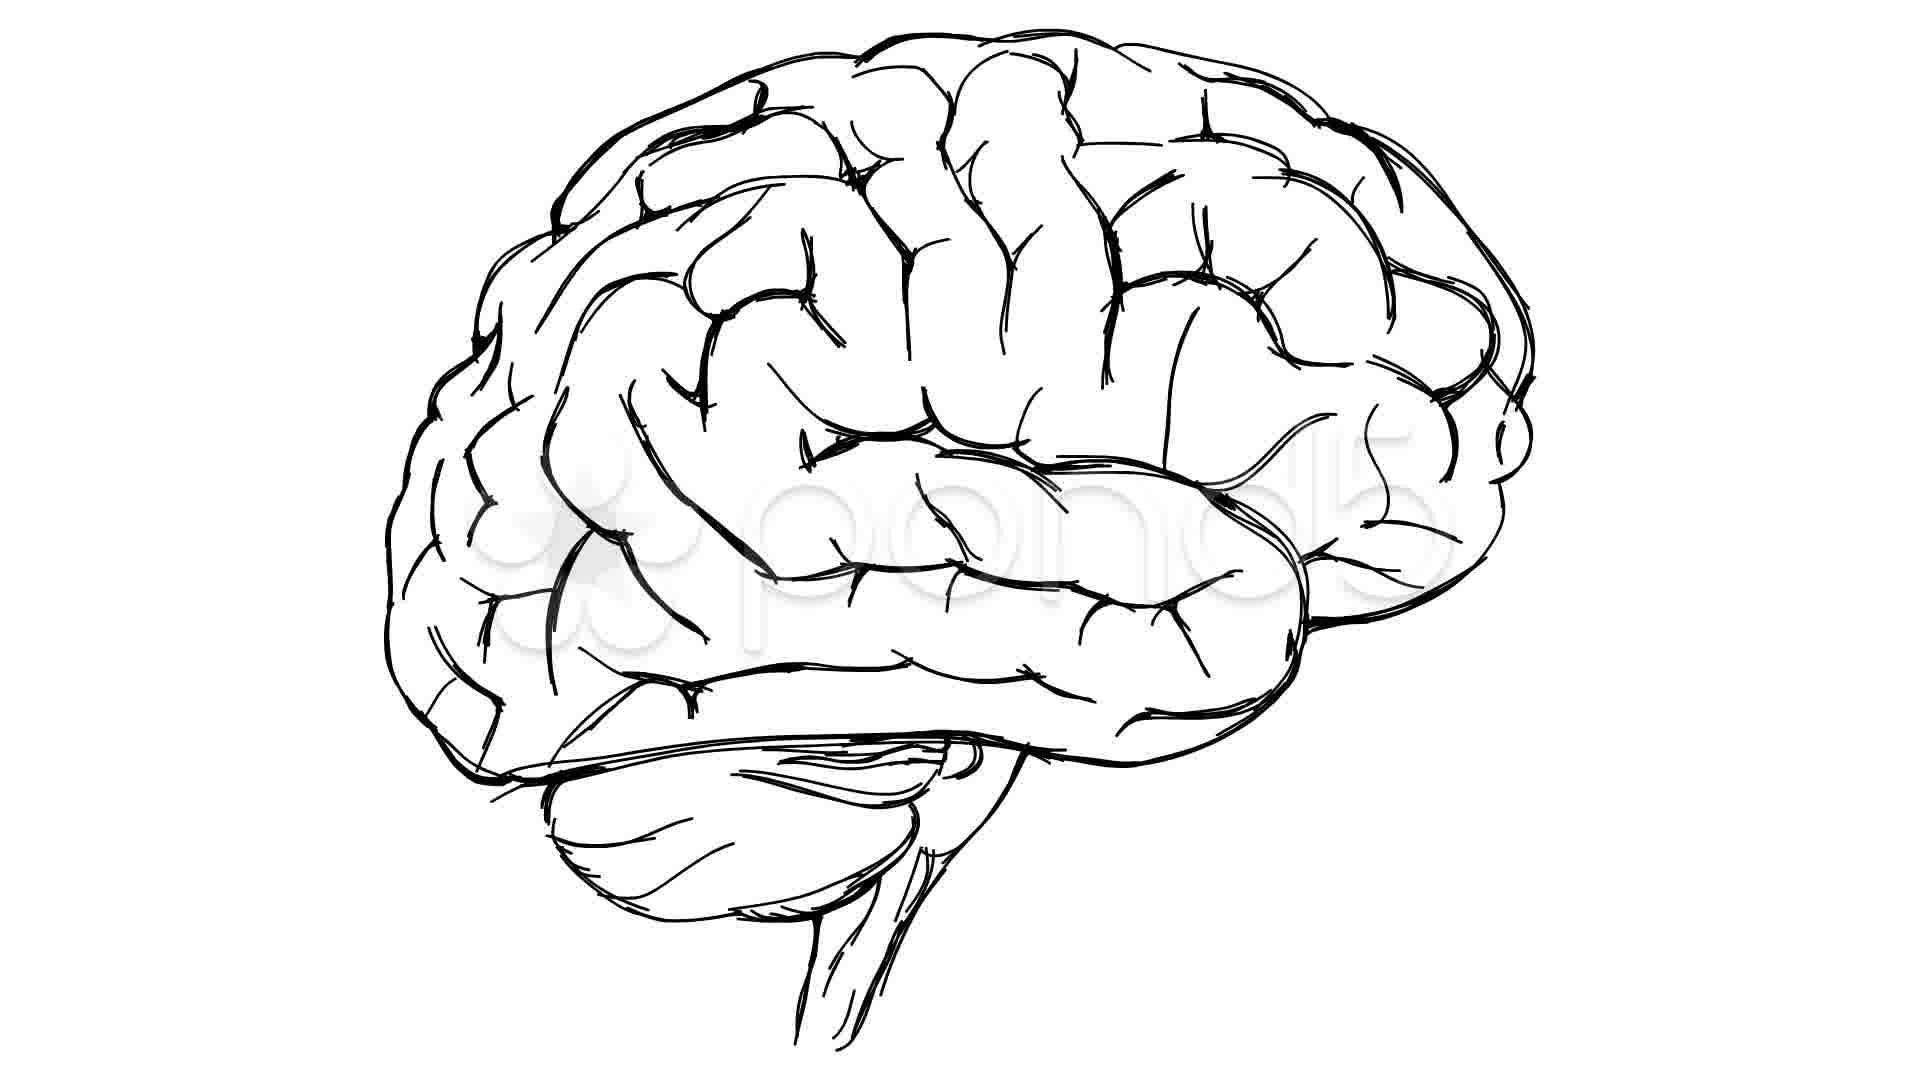 Human Brain Drawing At Getdrawings Free For Personal Use Human